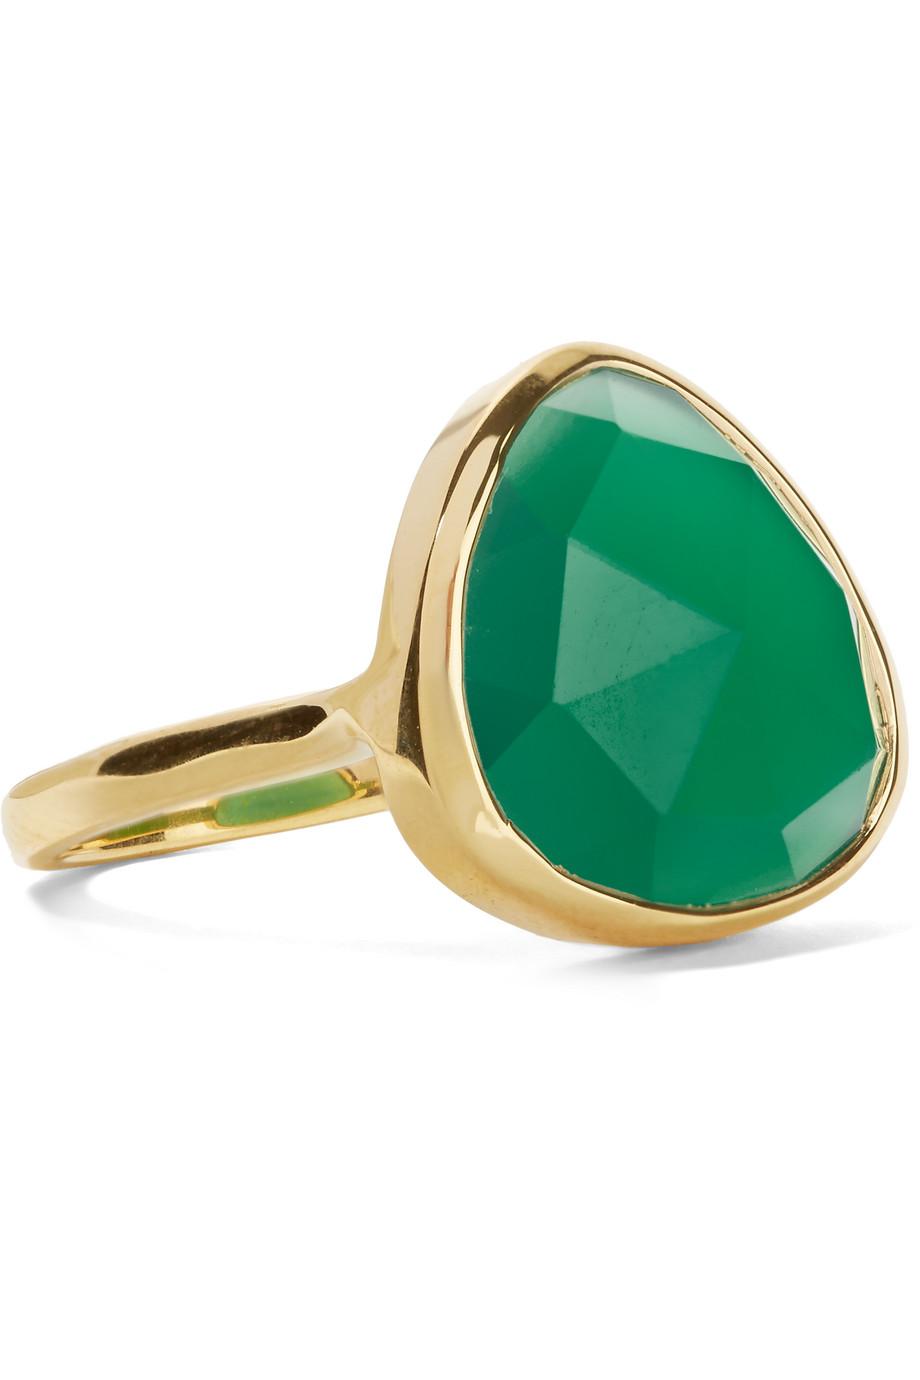 Monica Vinader Siren Gold-Plated Onyx Ring, Gold/Green, Women's